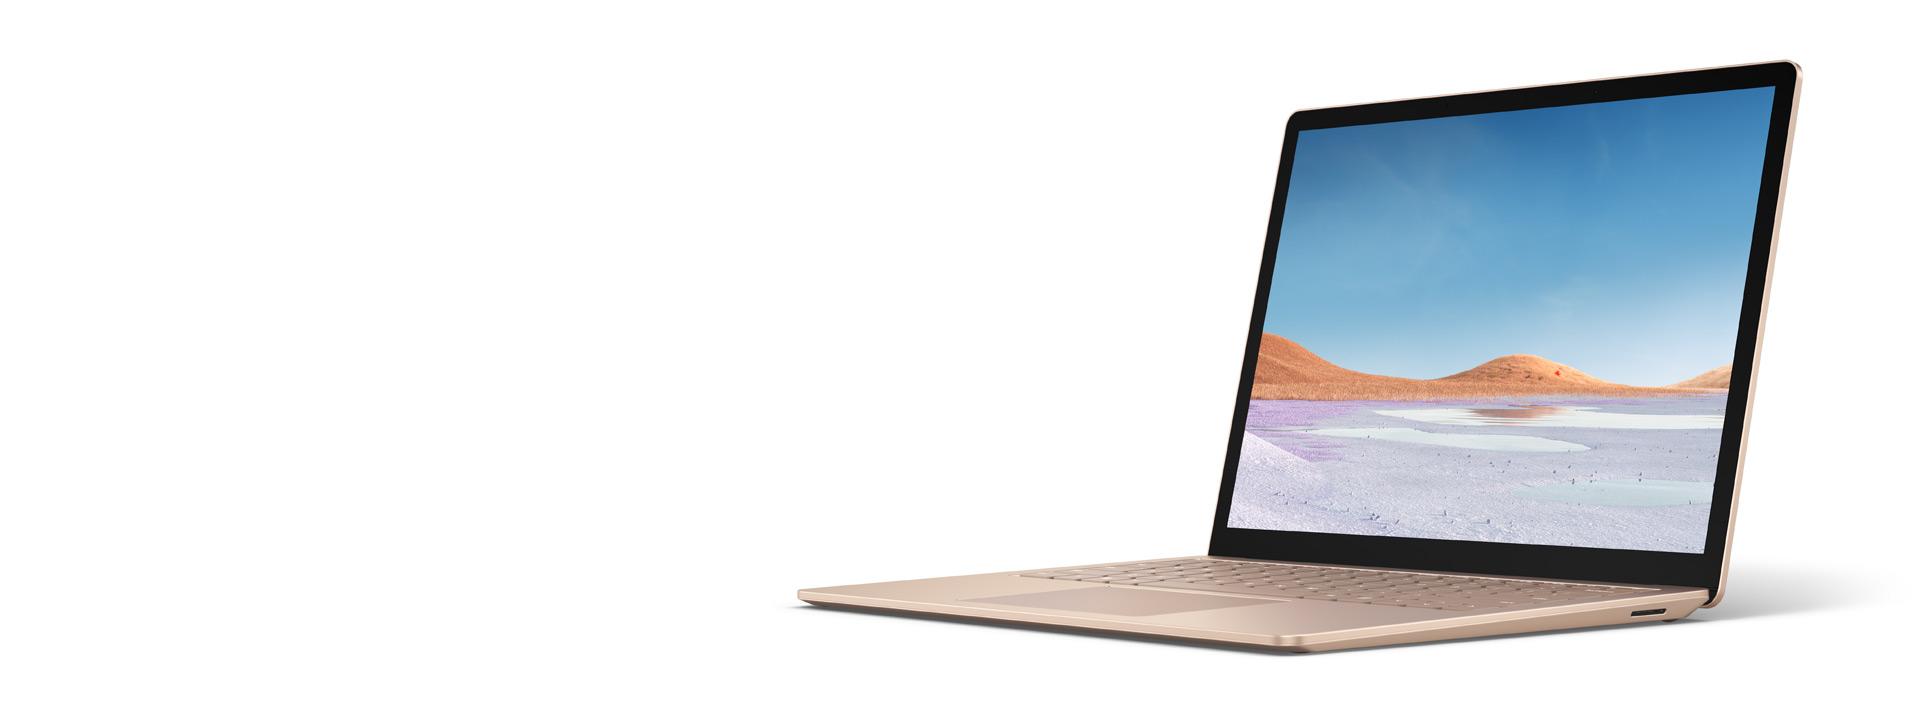 Sandstone Surface Laptop 3 13.5